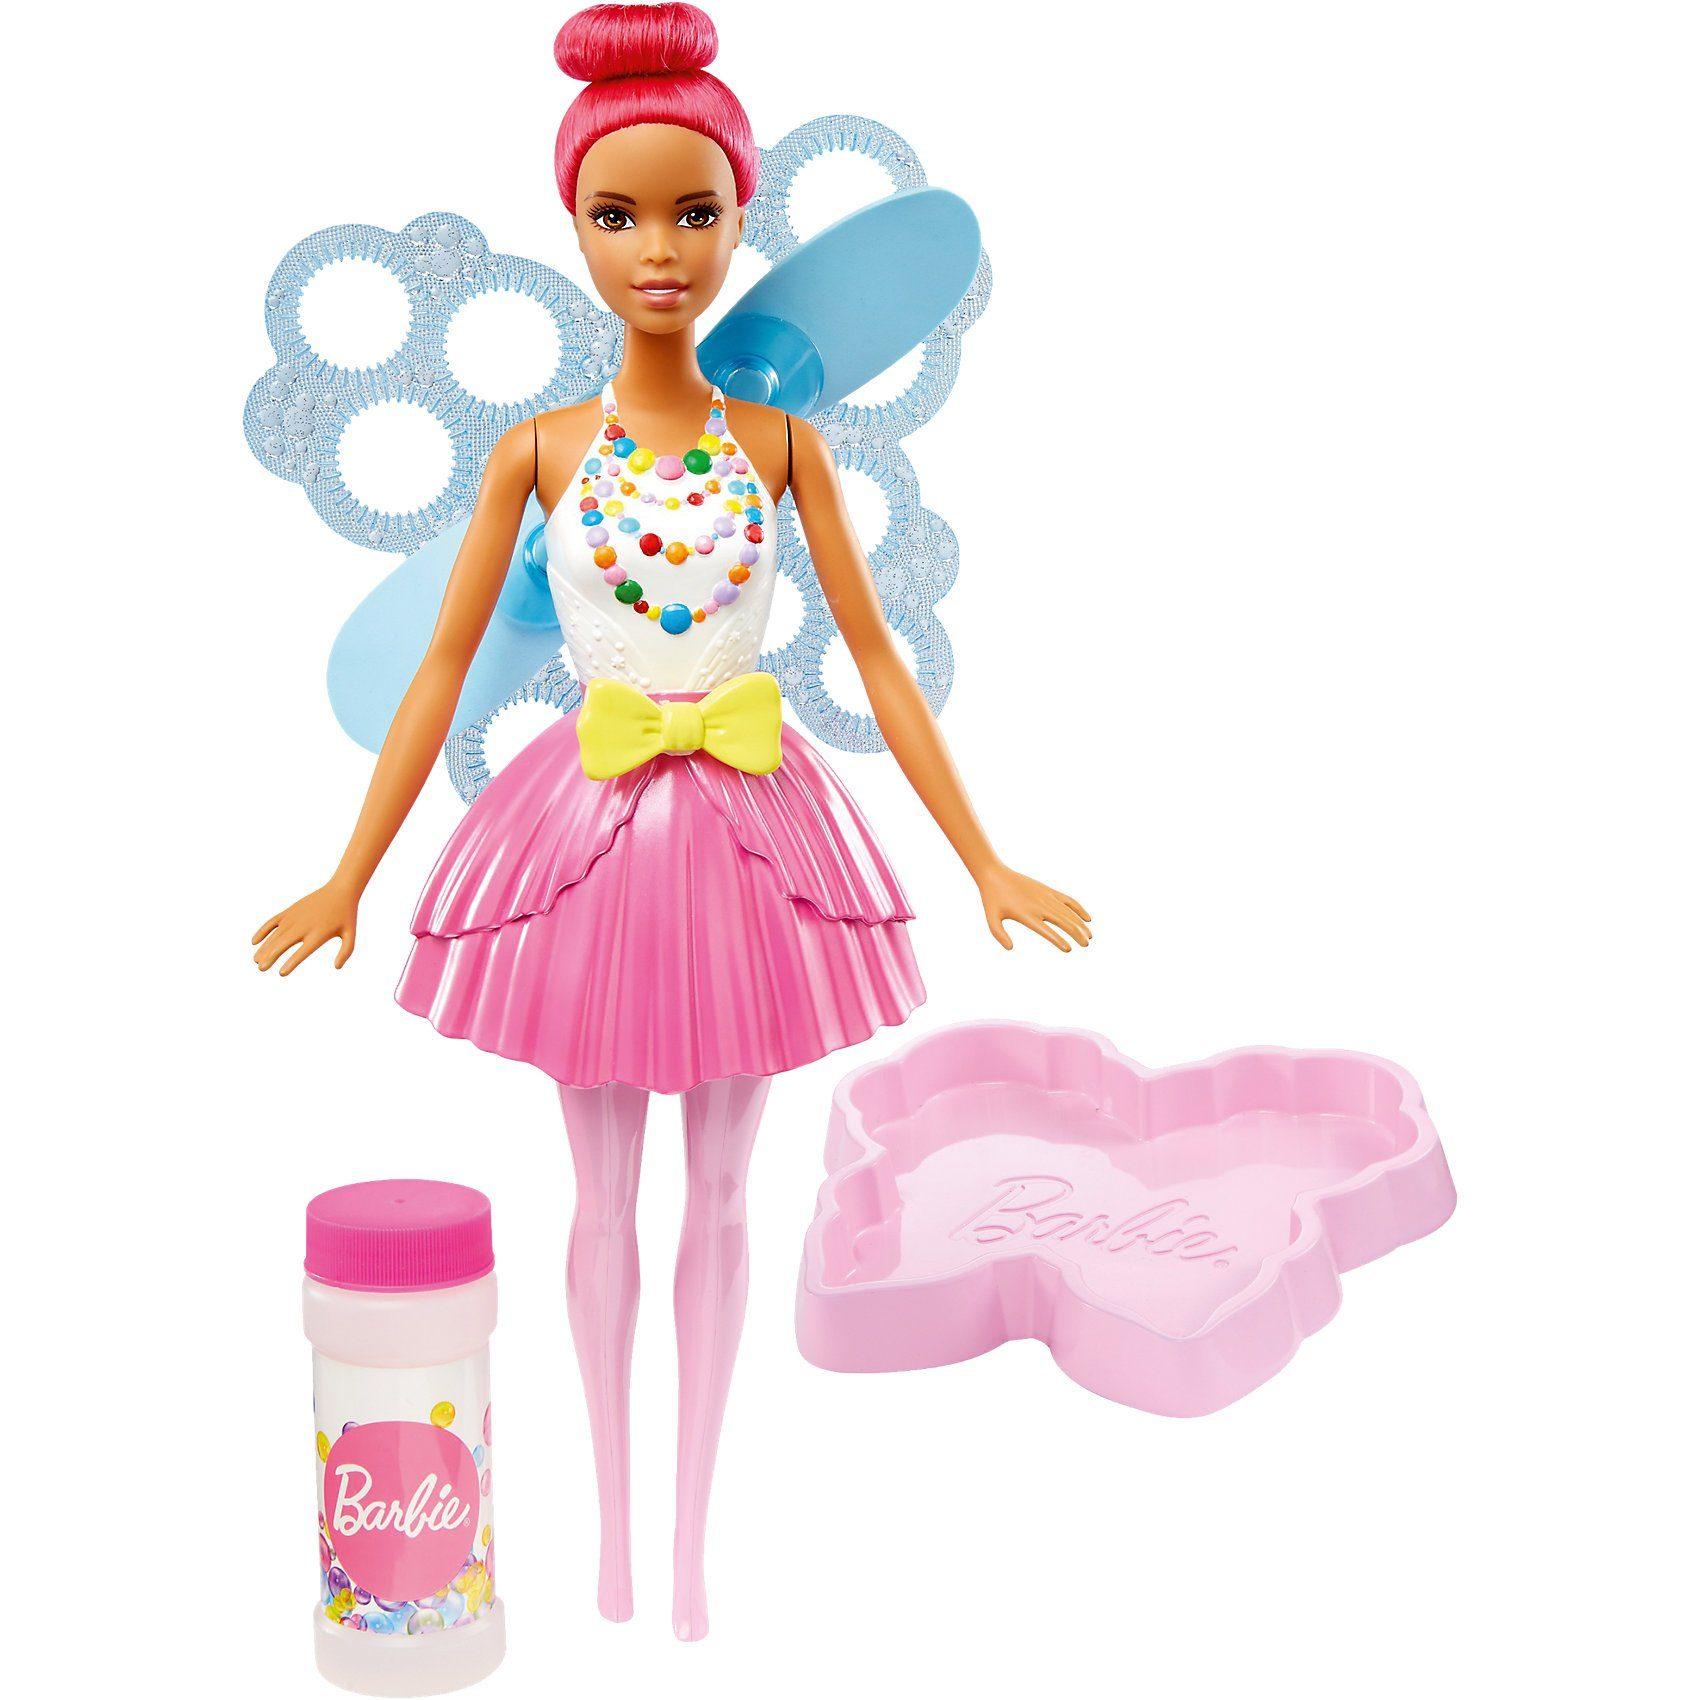 Mattel® Barbie Dreamtopia Seifenblasen Fee Puppe (pinkfarbenes Haar)